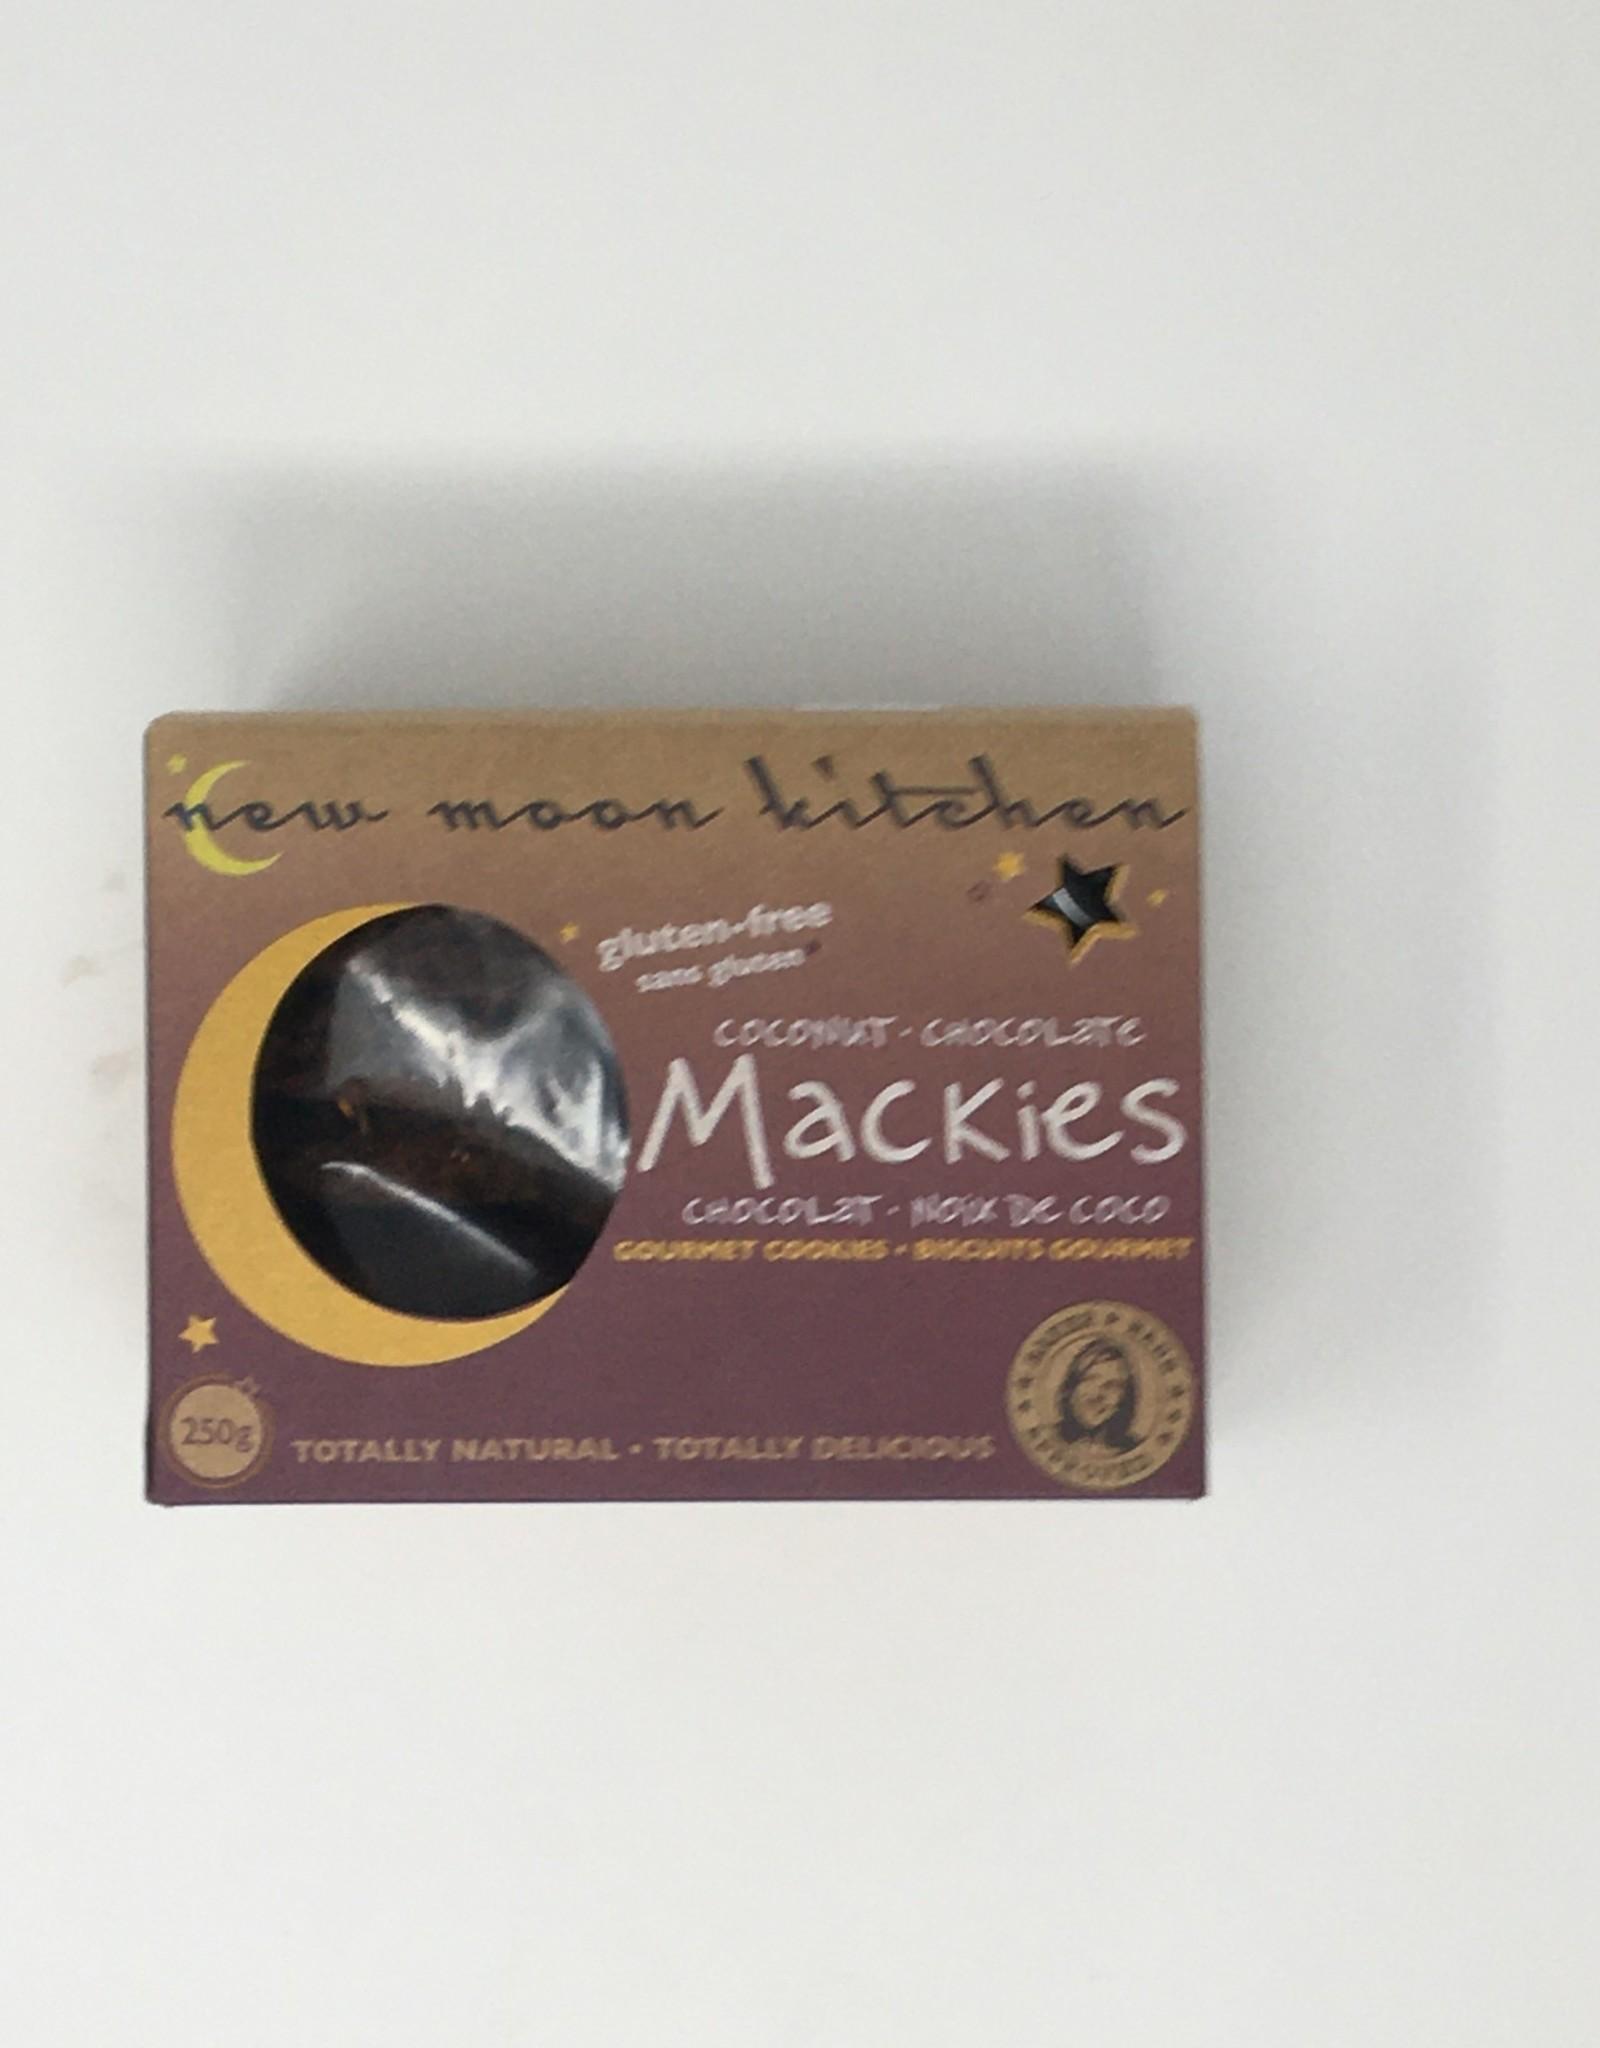 New Moon Kitchen New Moon Kitchen - Cookies, Mackies Chocolate Coconut (box)